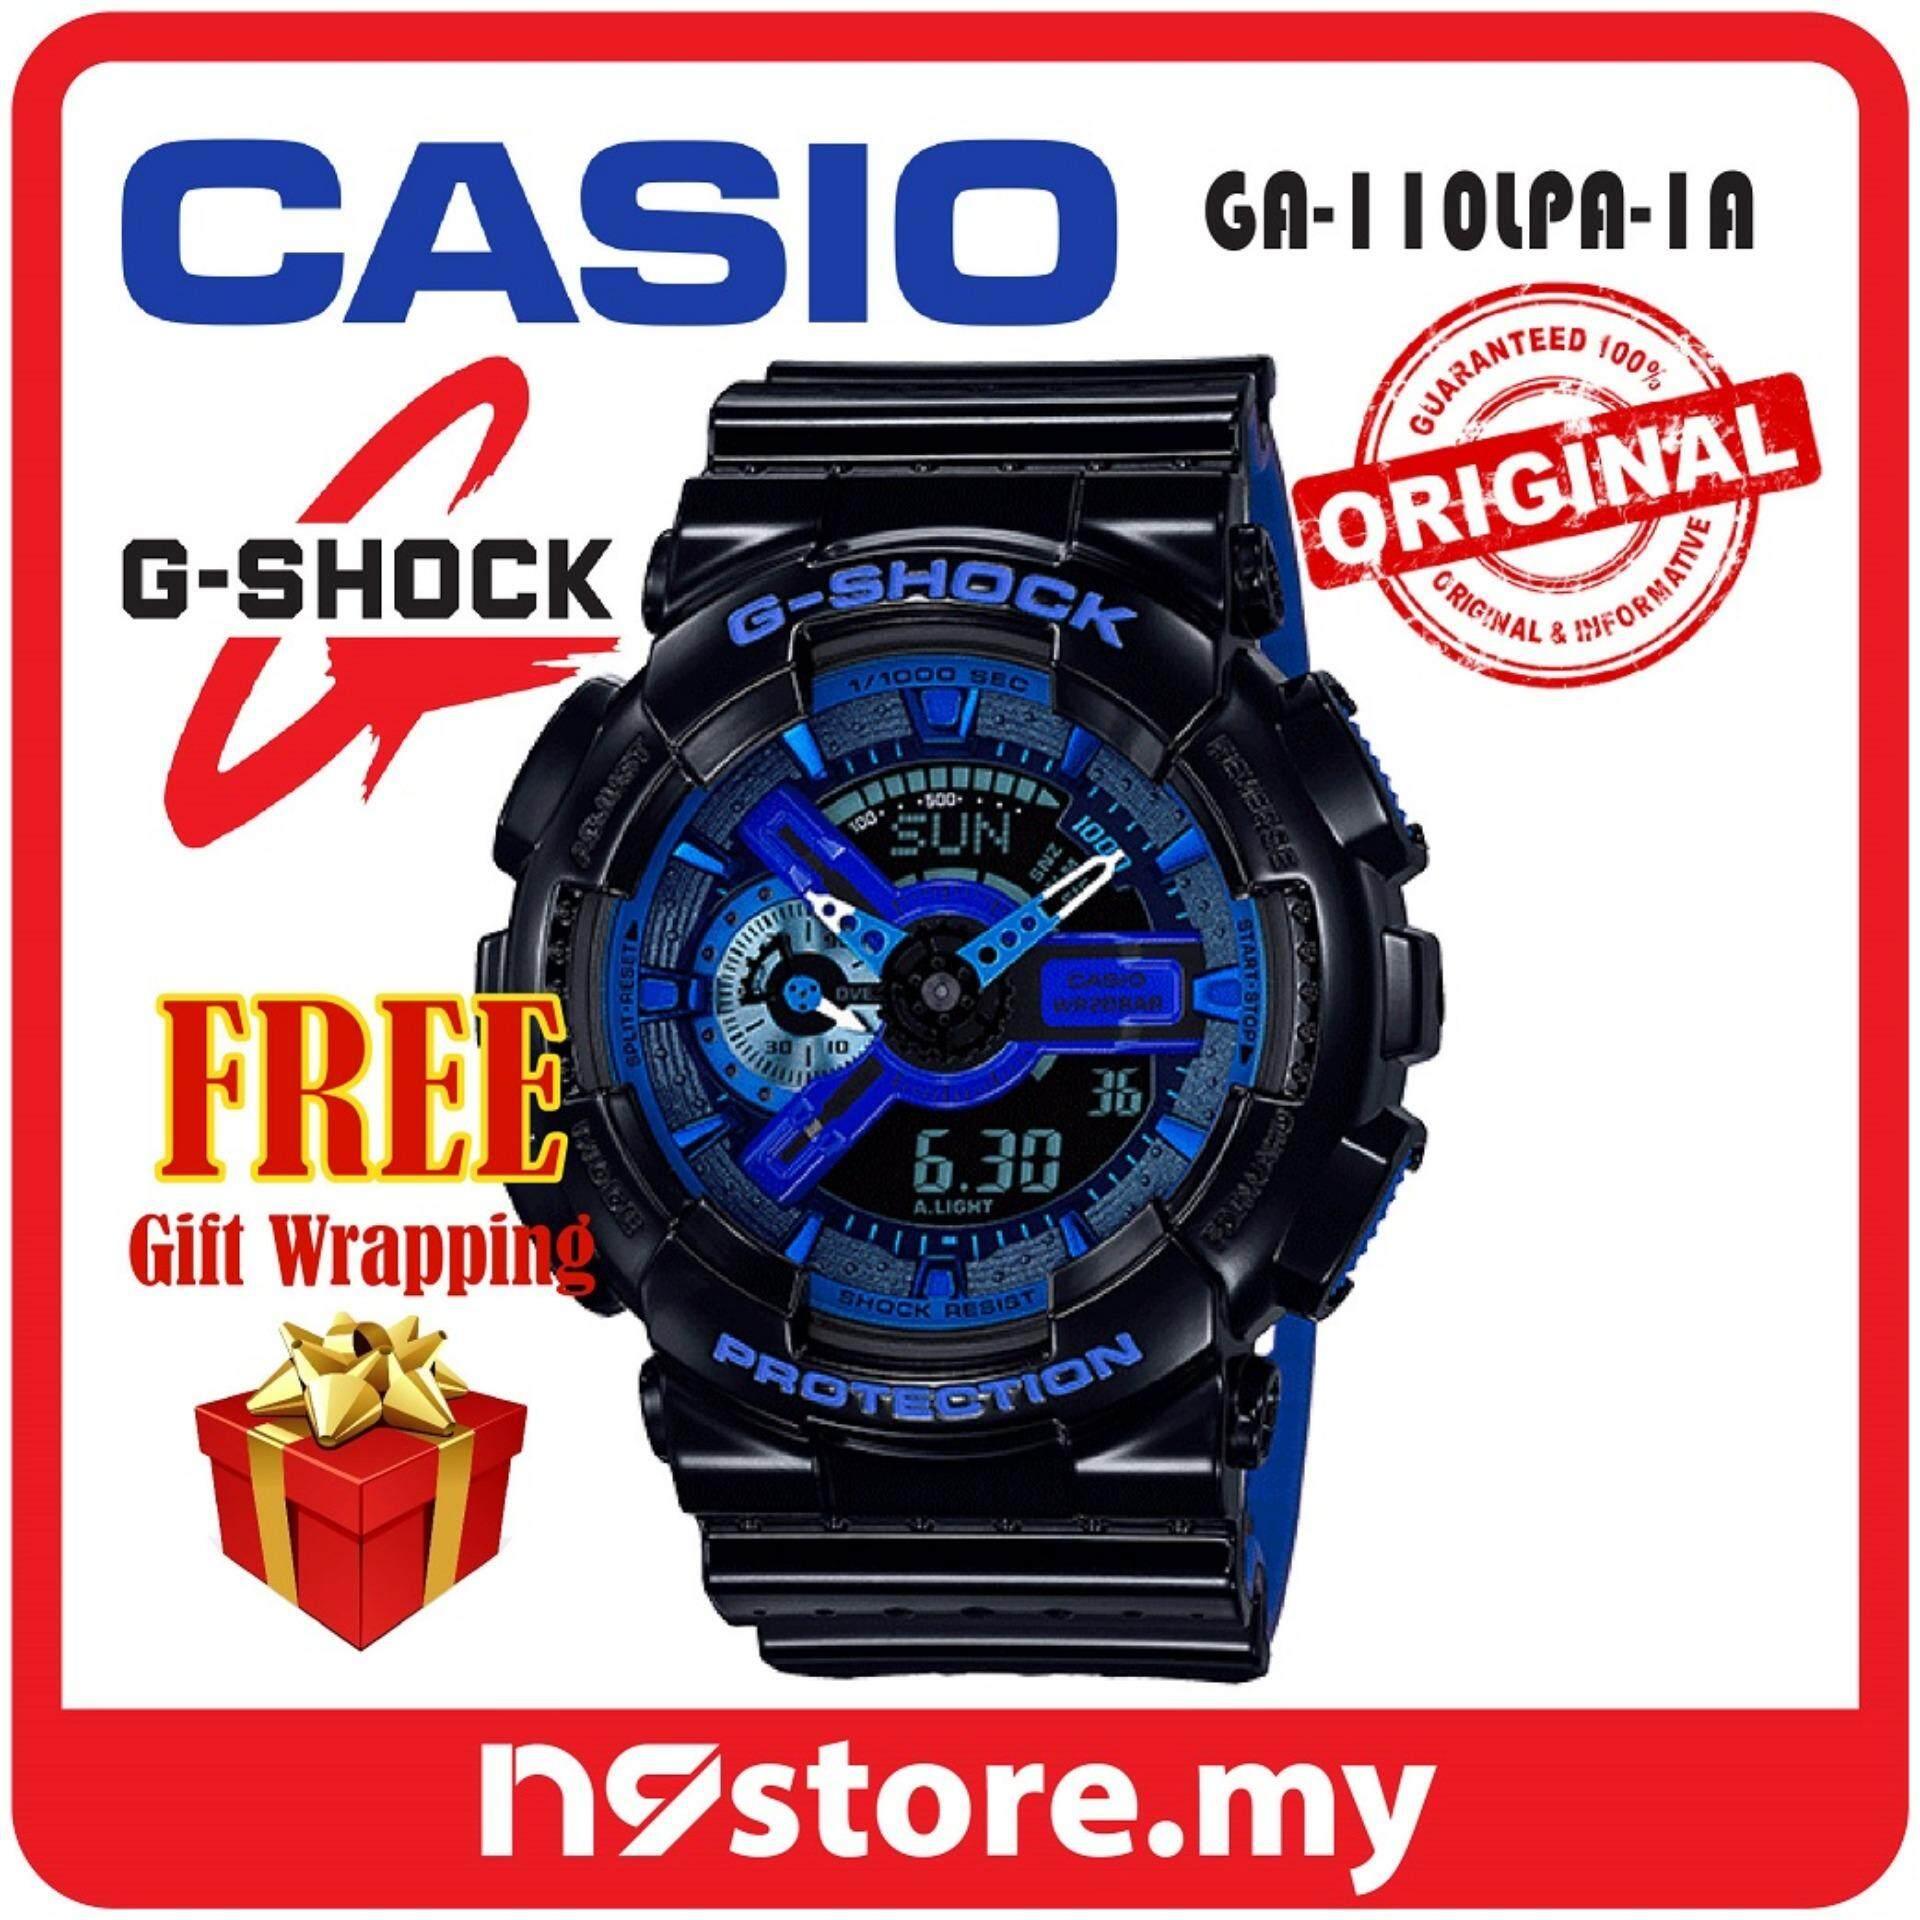 Casio G-Shock GA-110LPA-1A Analog Digital Special Color Sports Watch